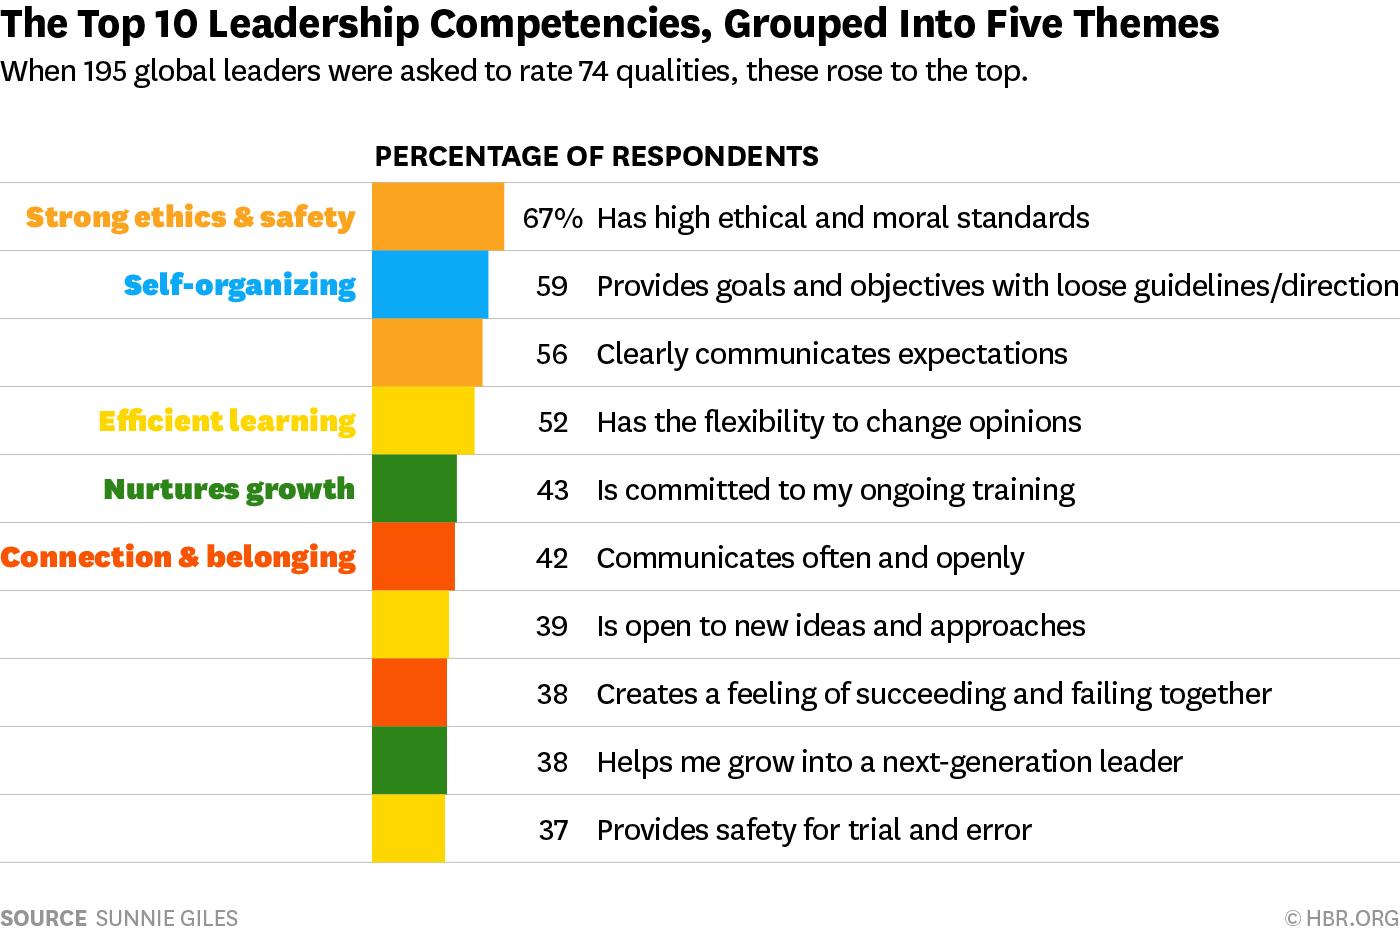 Core leadership competencies, via Harvard Business Review